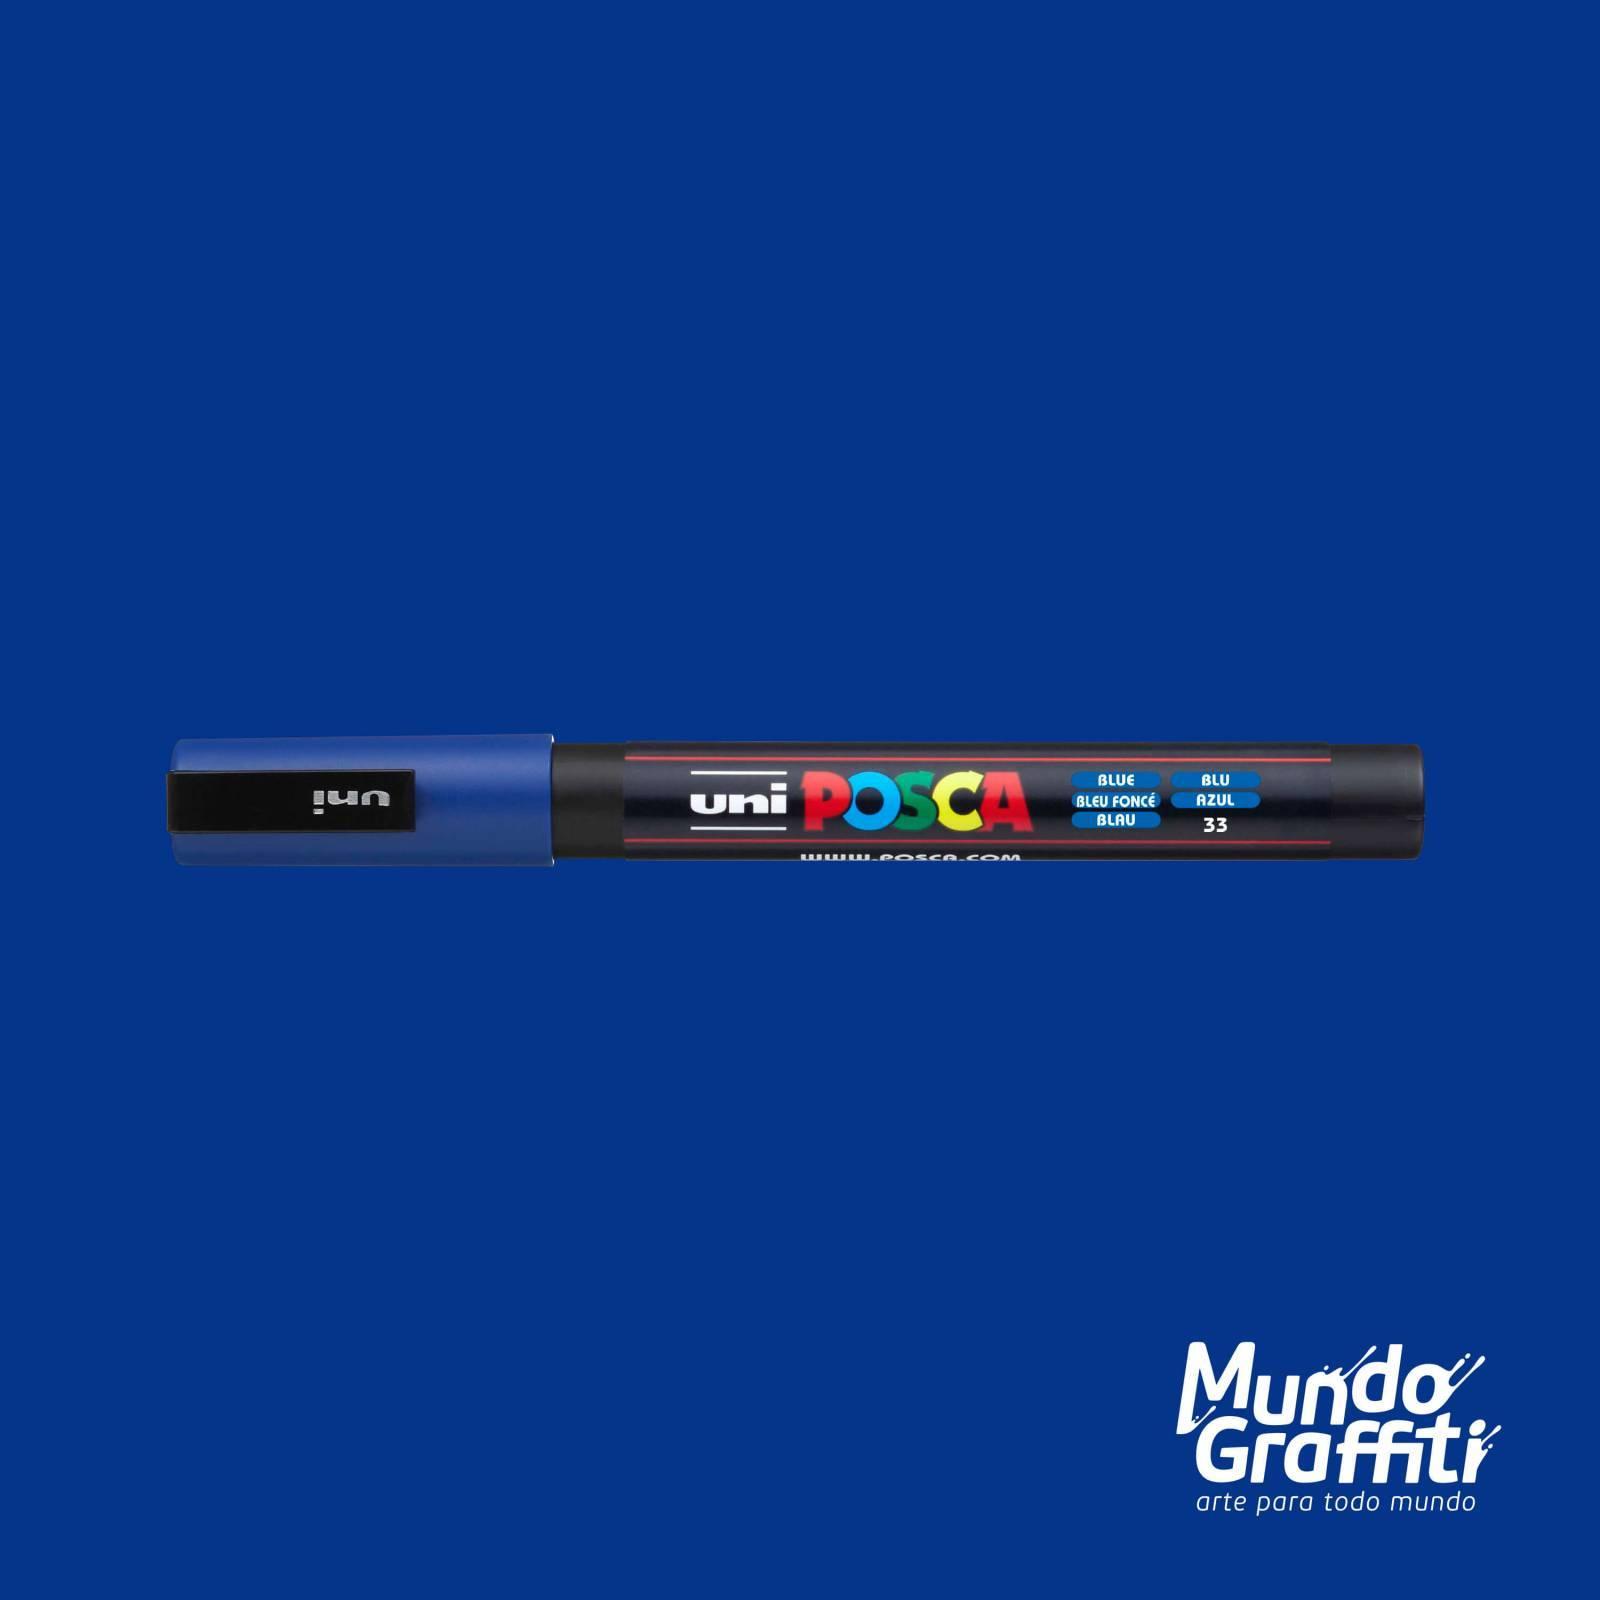 Caneta Posca 3M Azul - Mundo Graffiti